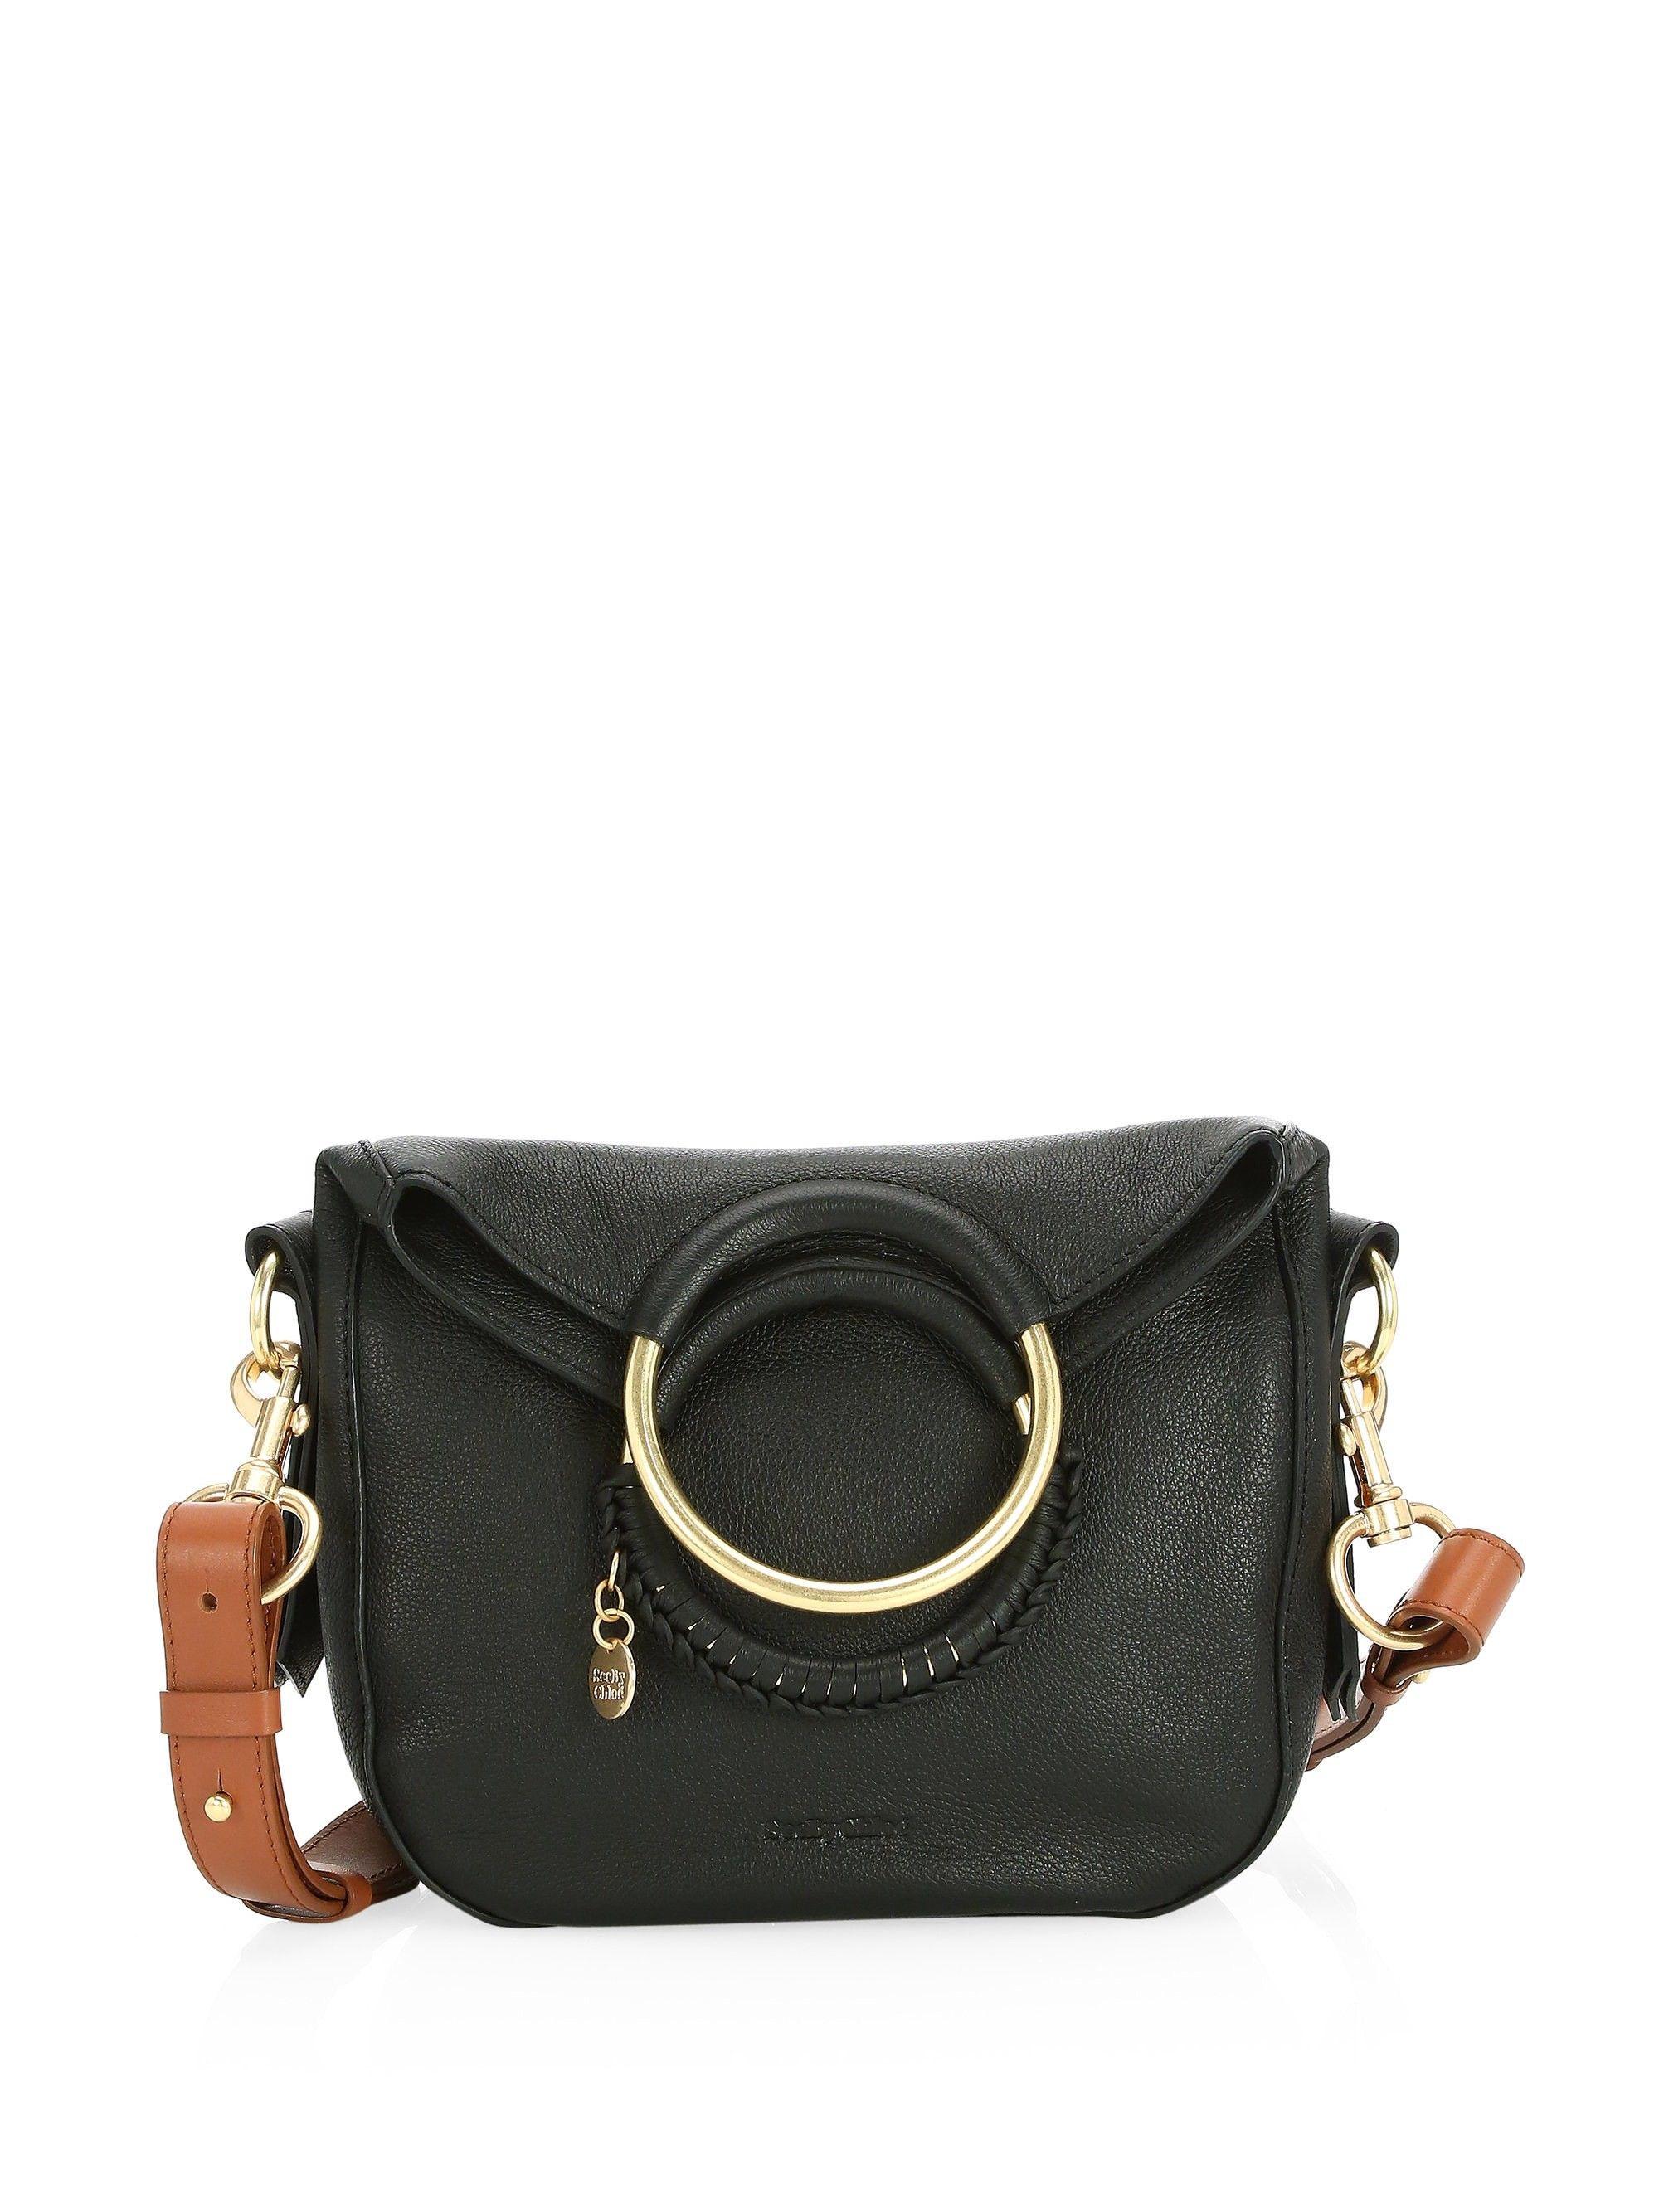 9efc81c65f See By Chloé Small Leather Monroe Bag - Black